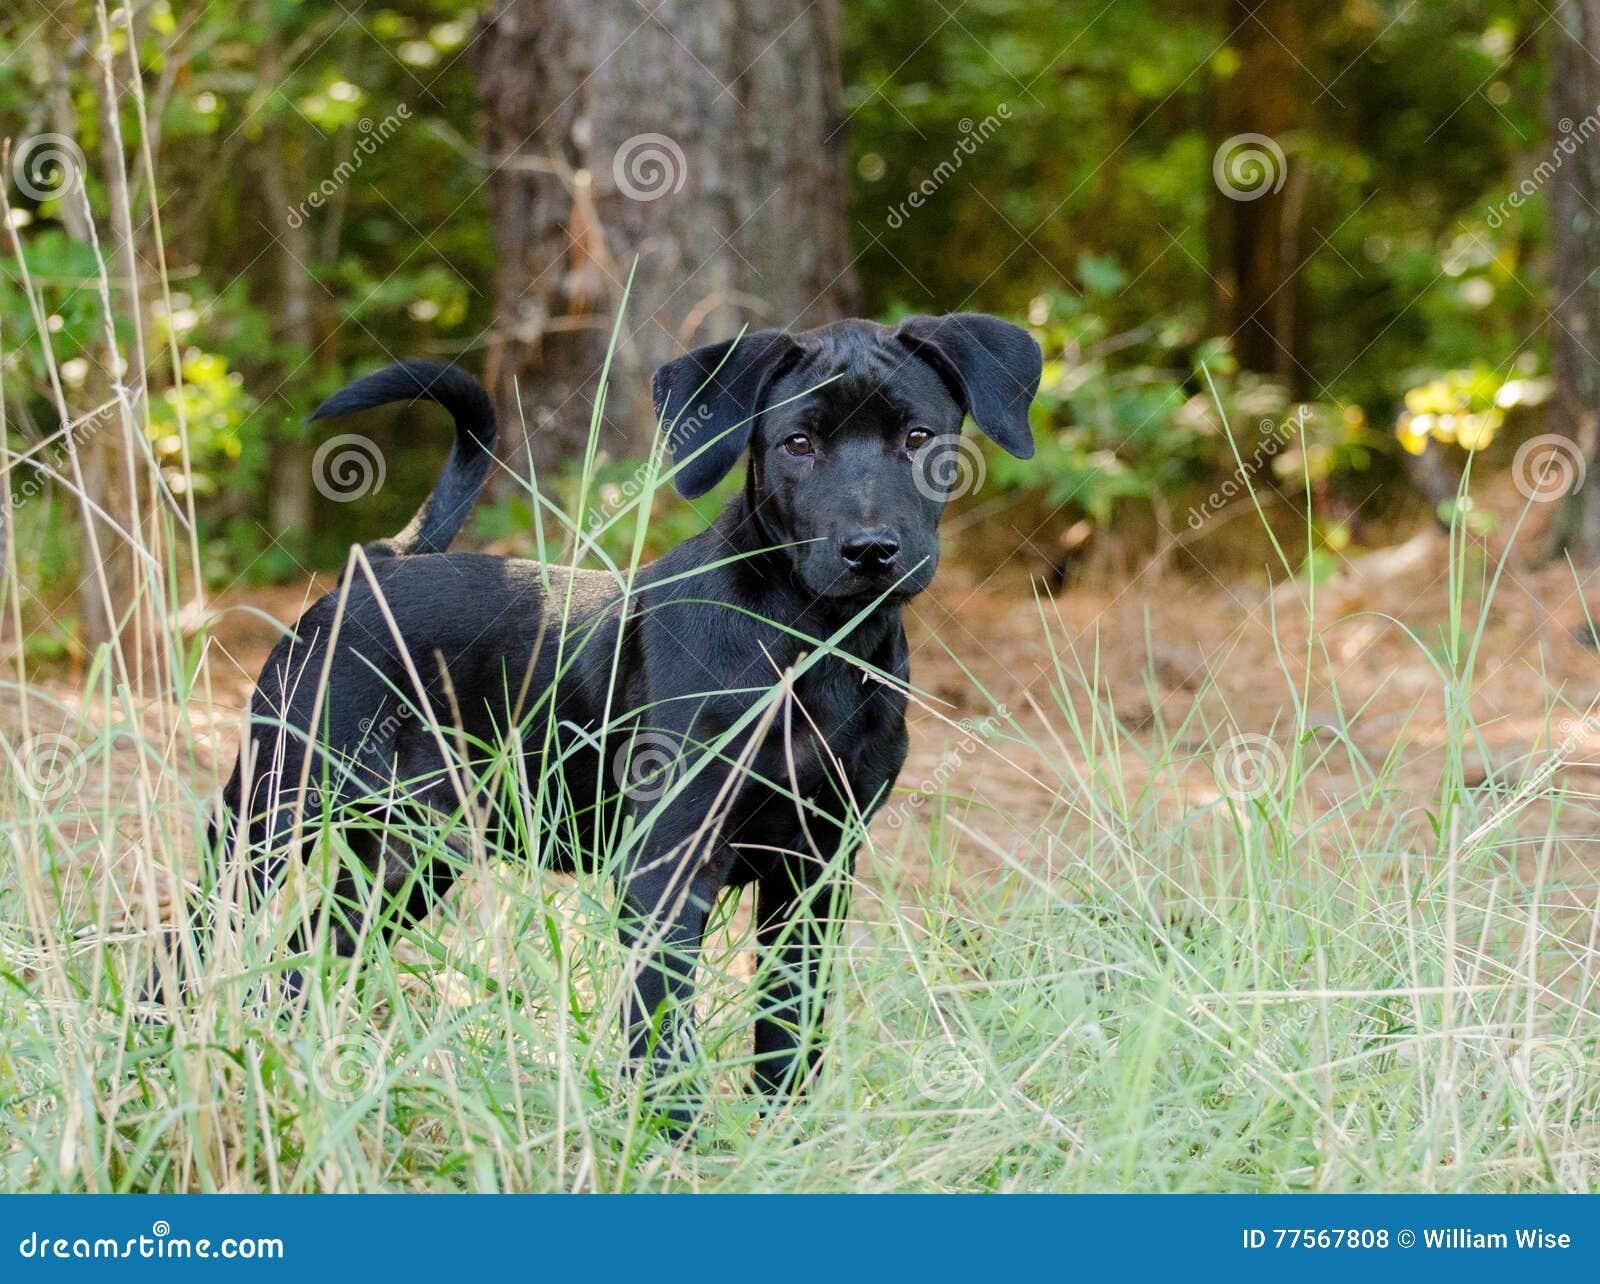 Black Lab Puppy Adoption Outdoor Stock Photo - Image of